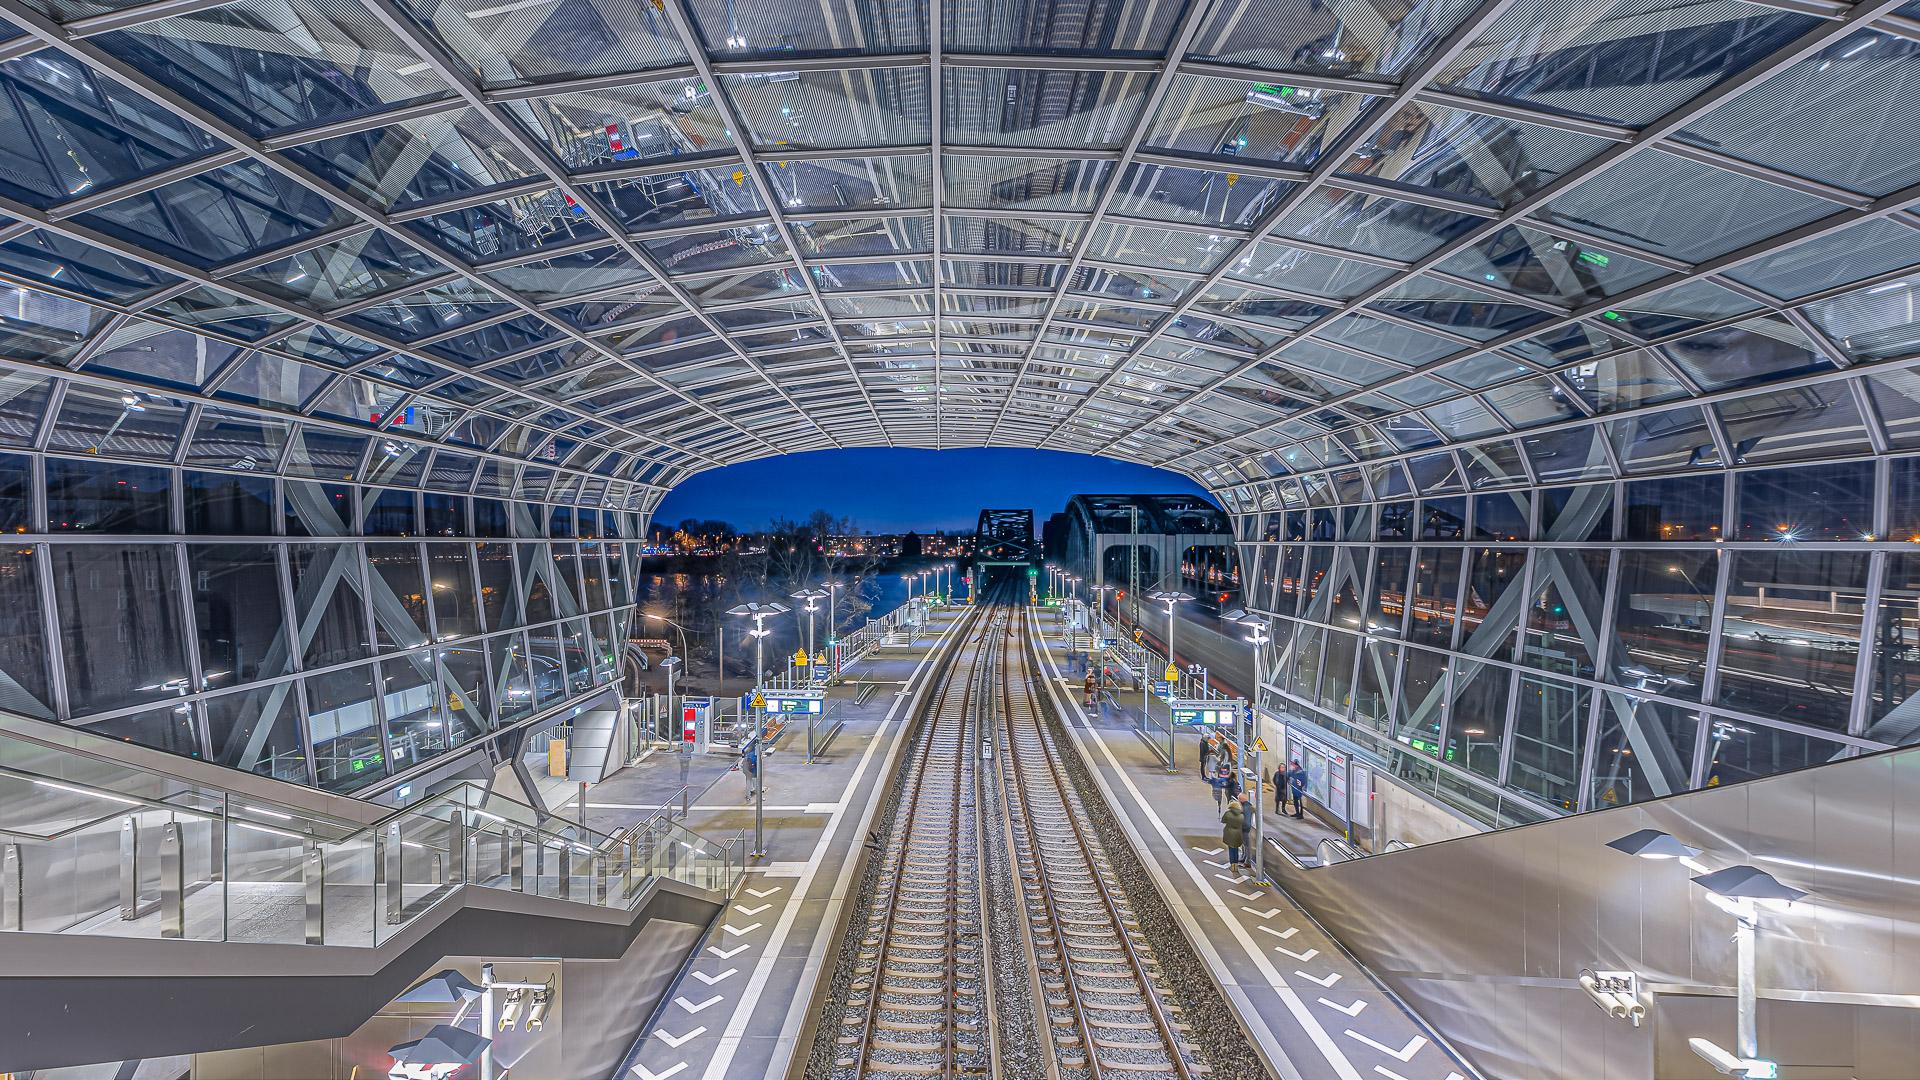 S-Bahnhof Hamburg Elbbrücken